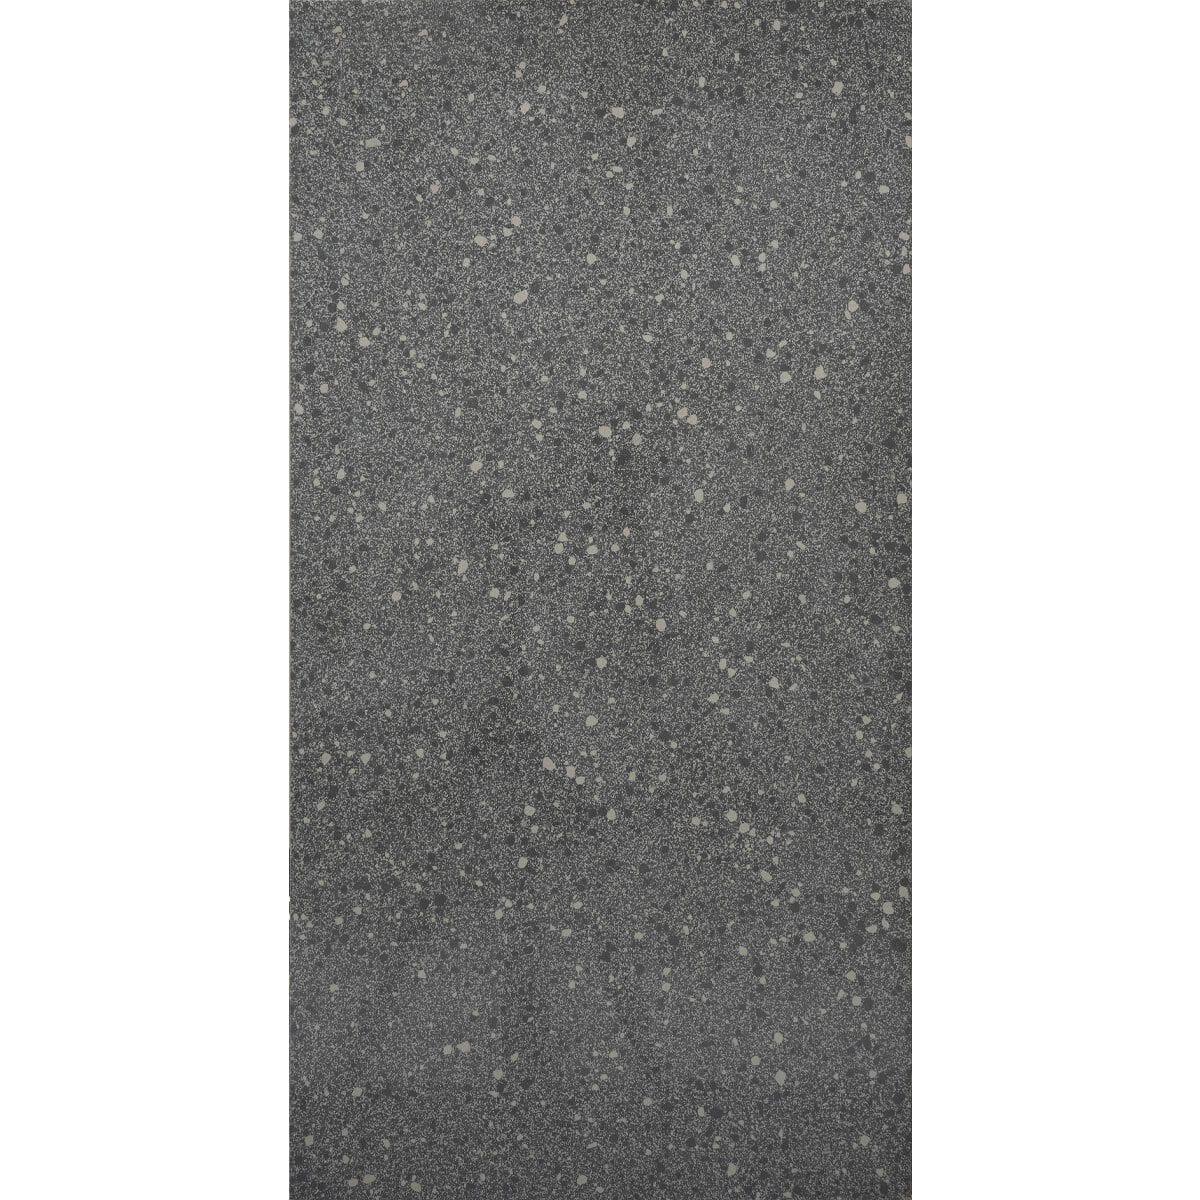 GRANULE GRAPHITE T10352 P1